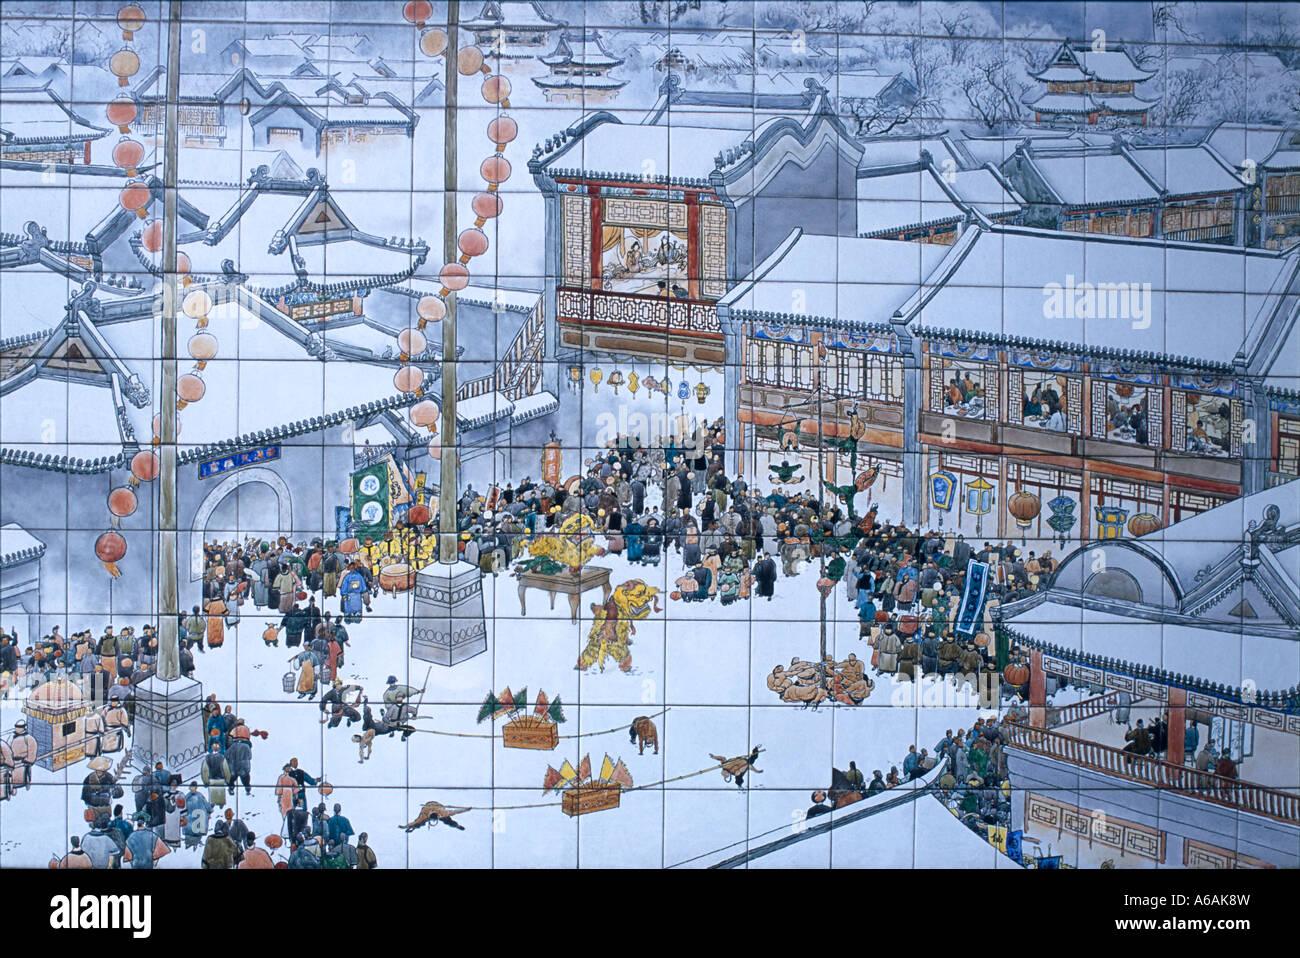 China, Hebei, Tianjin, Tianhou Temple, decorative tilework on wall - Stock Image